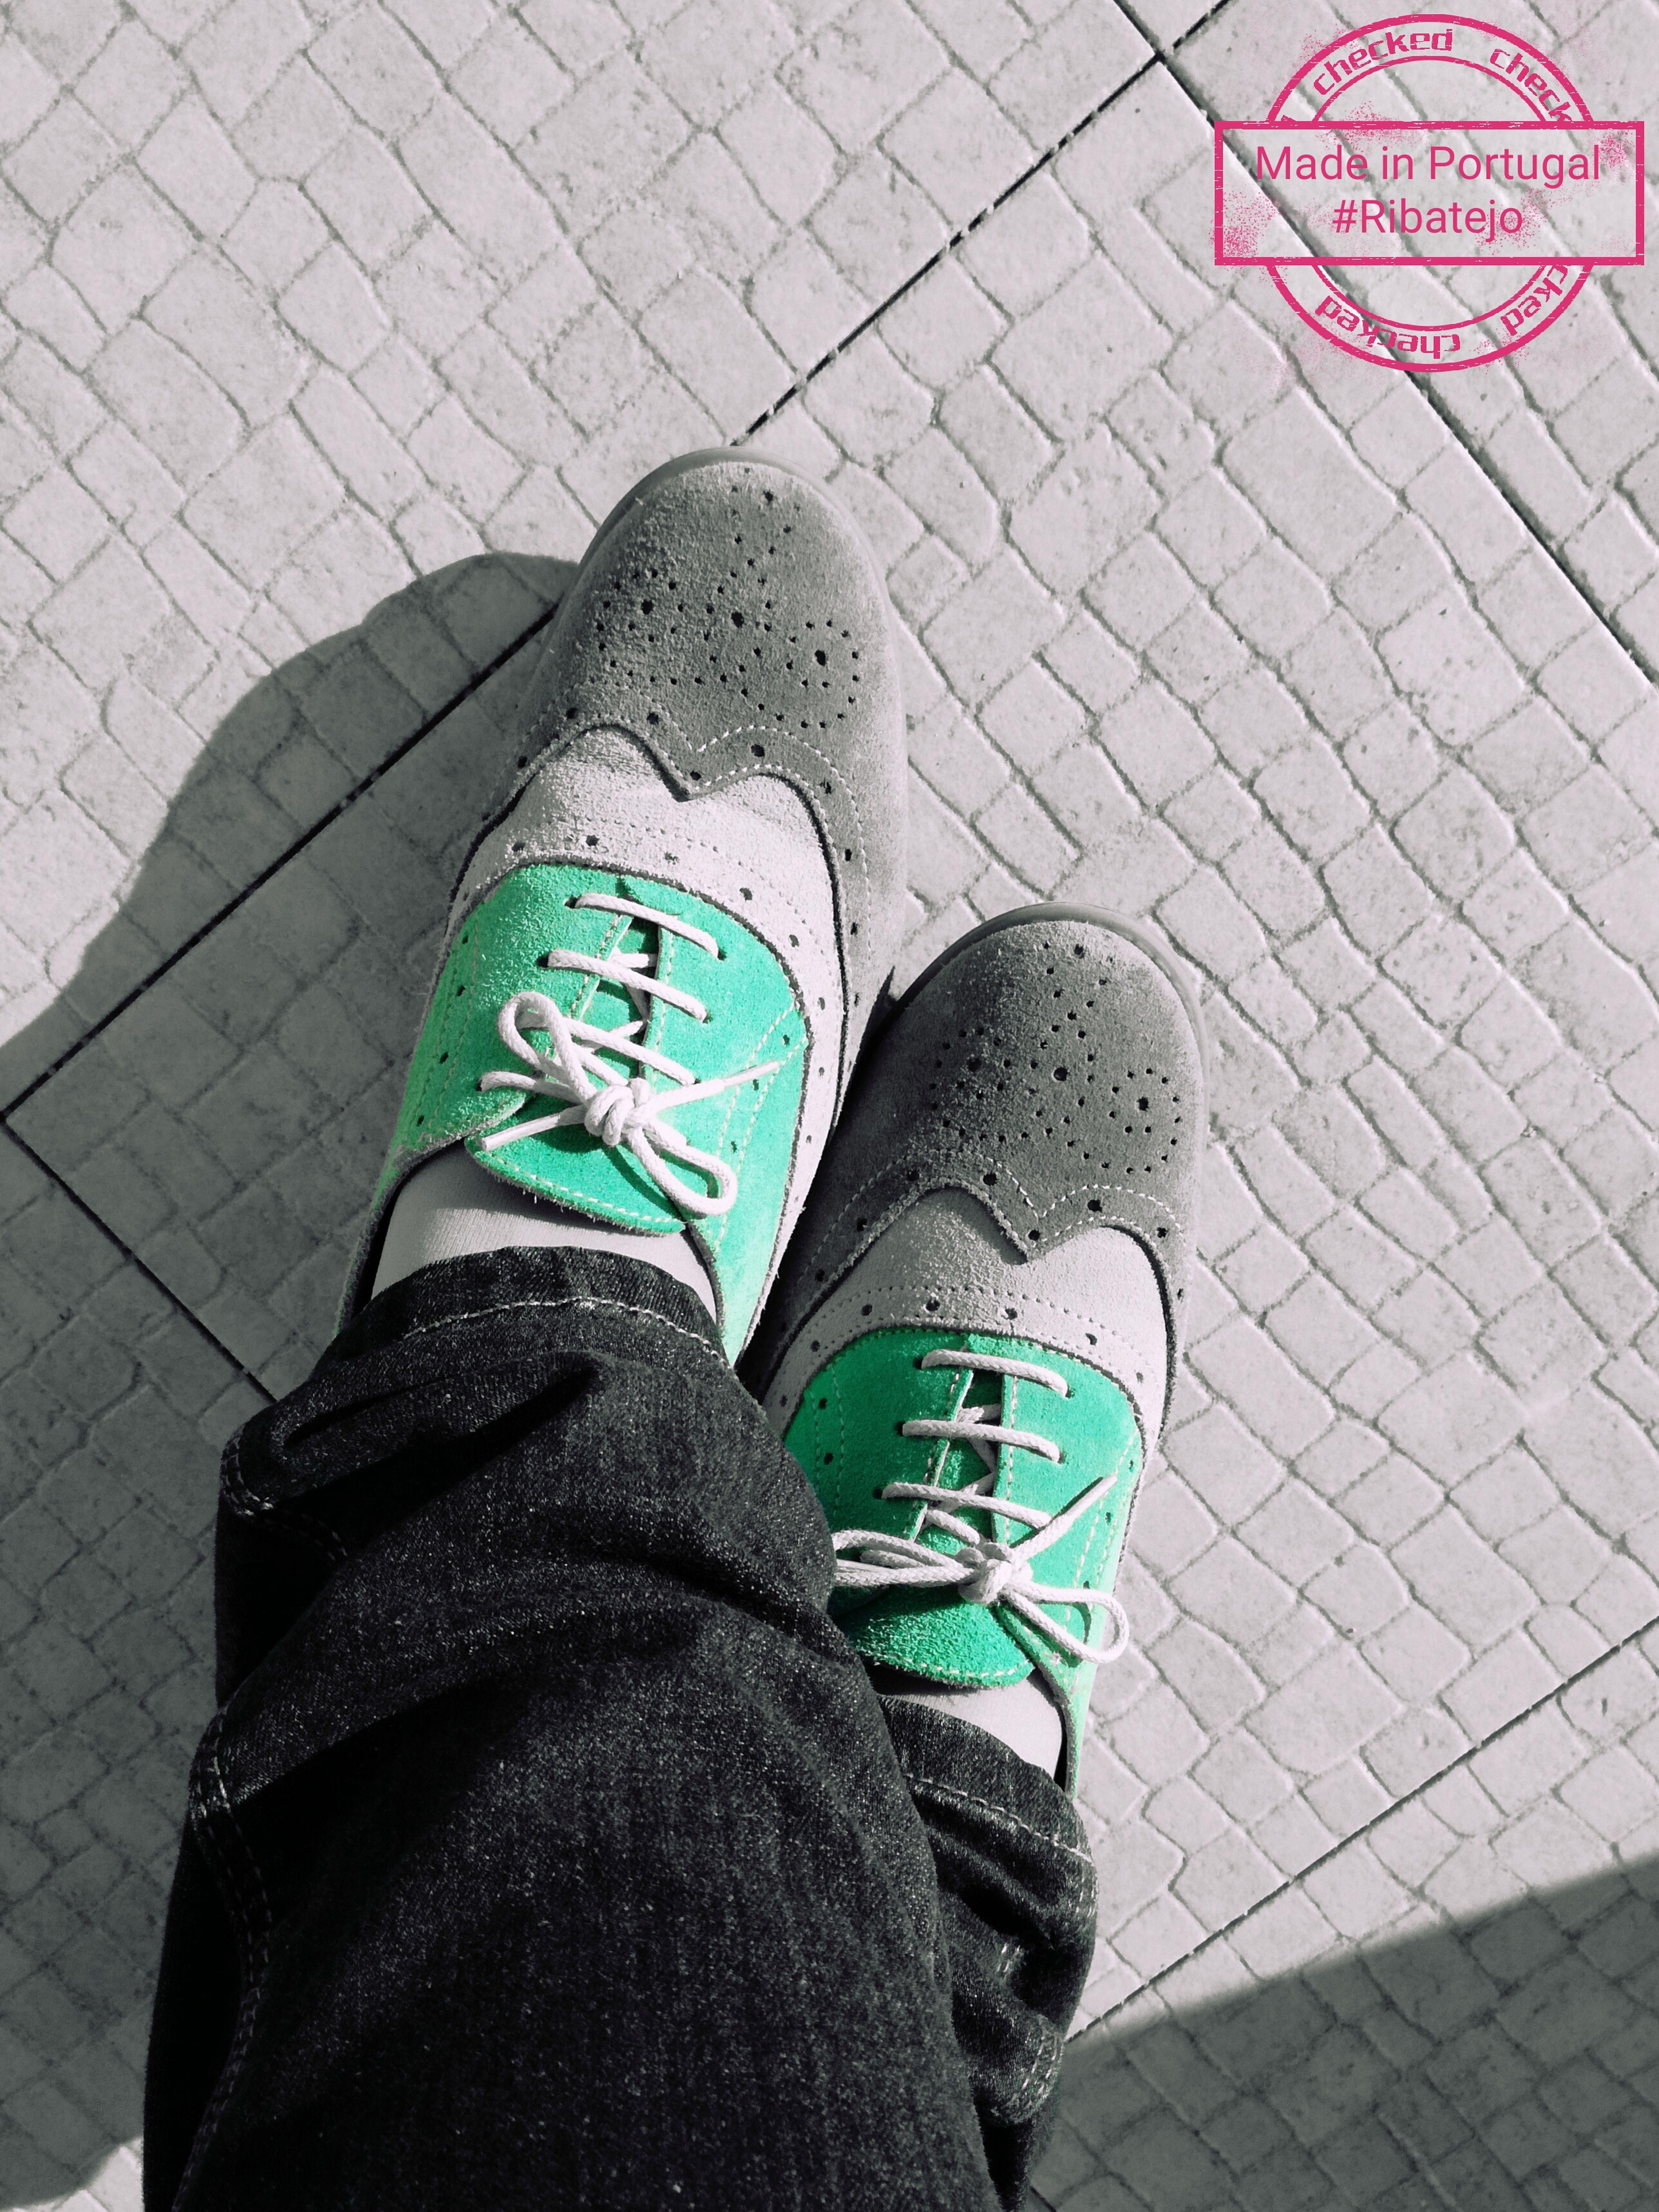 PortugueseShoes Closeup Walking Away FloorTexture SunnyDay Springtime 😊👣🌸☀ Decas2017